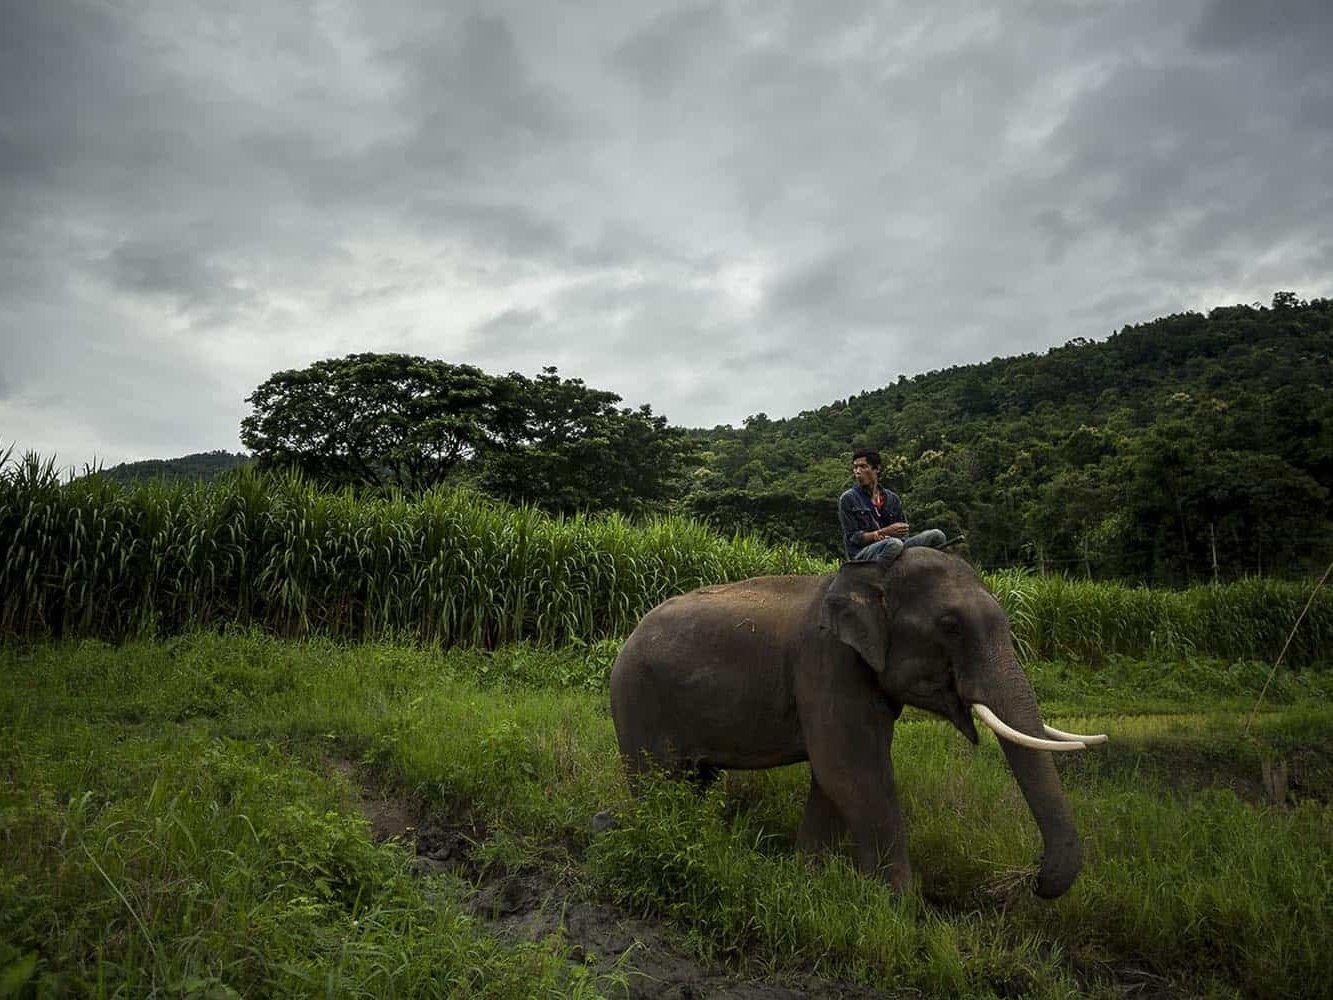 vietnam photographer mahout family binhdang 1